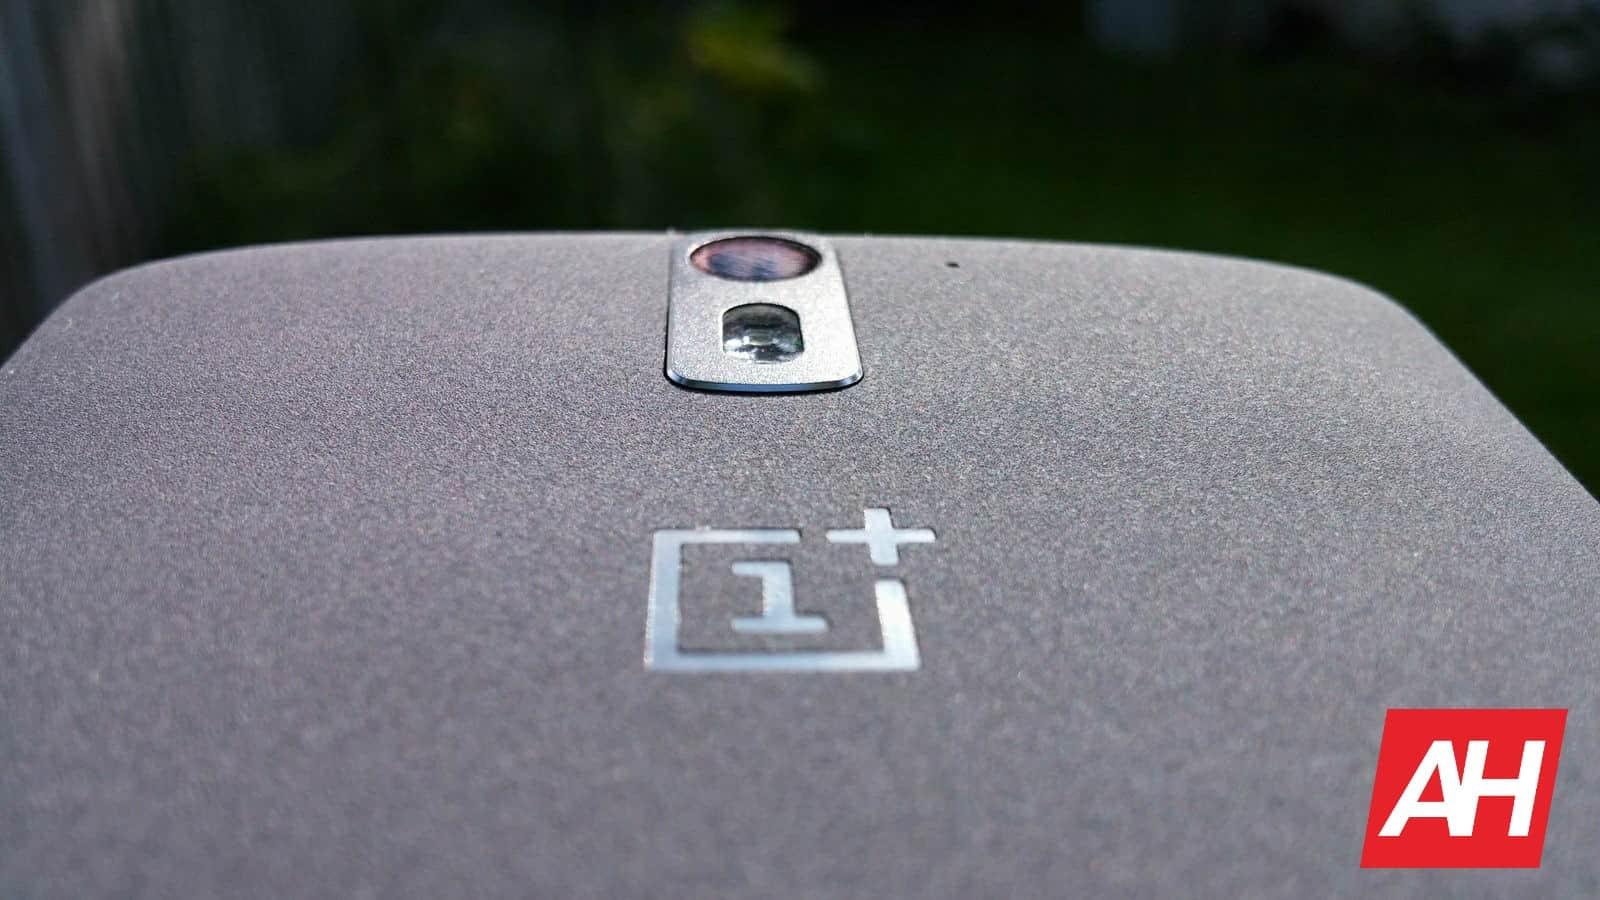 AH OnePlus One new logo 1